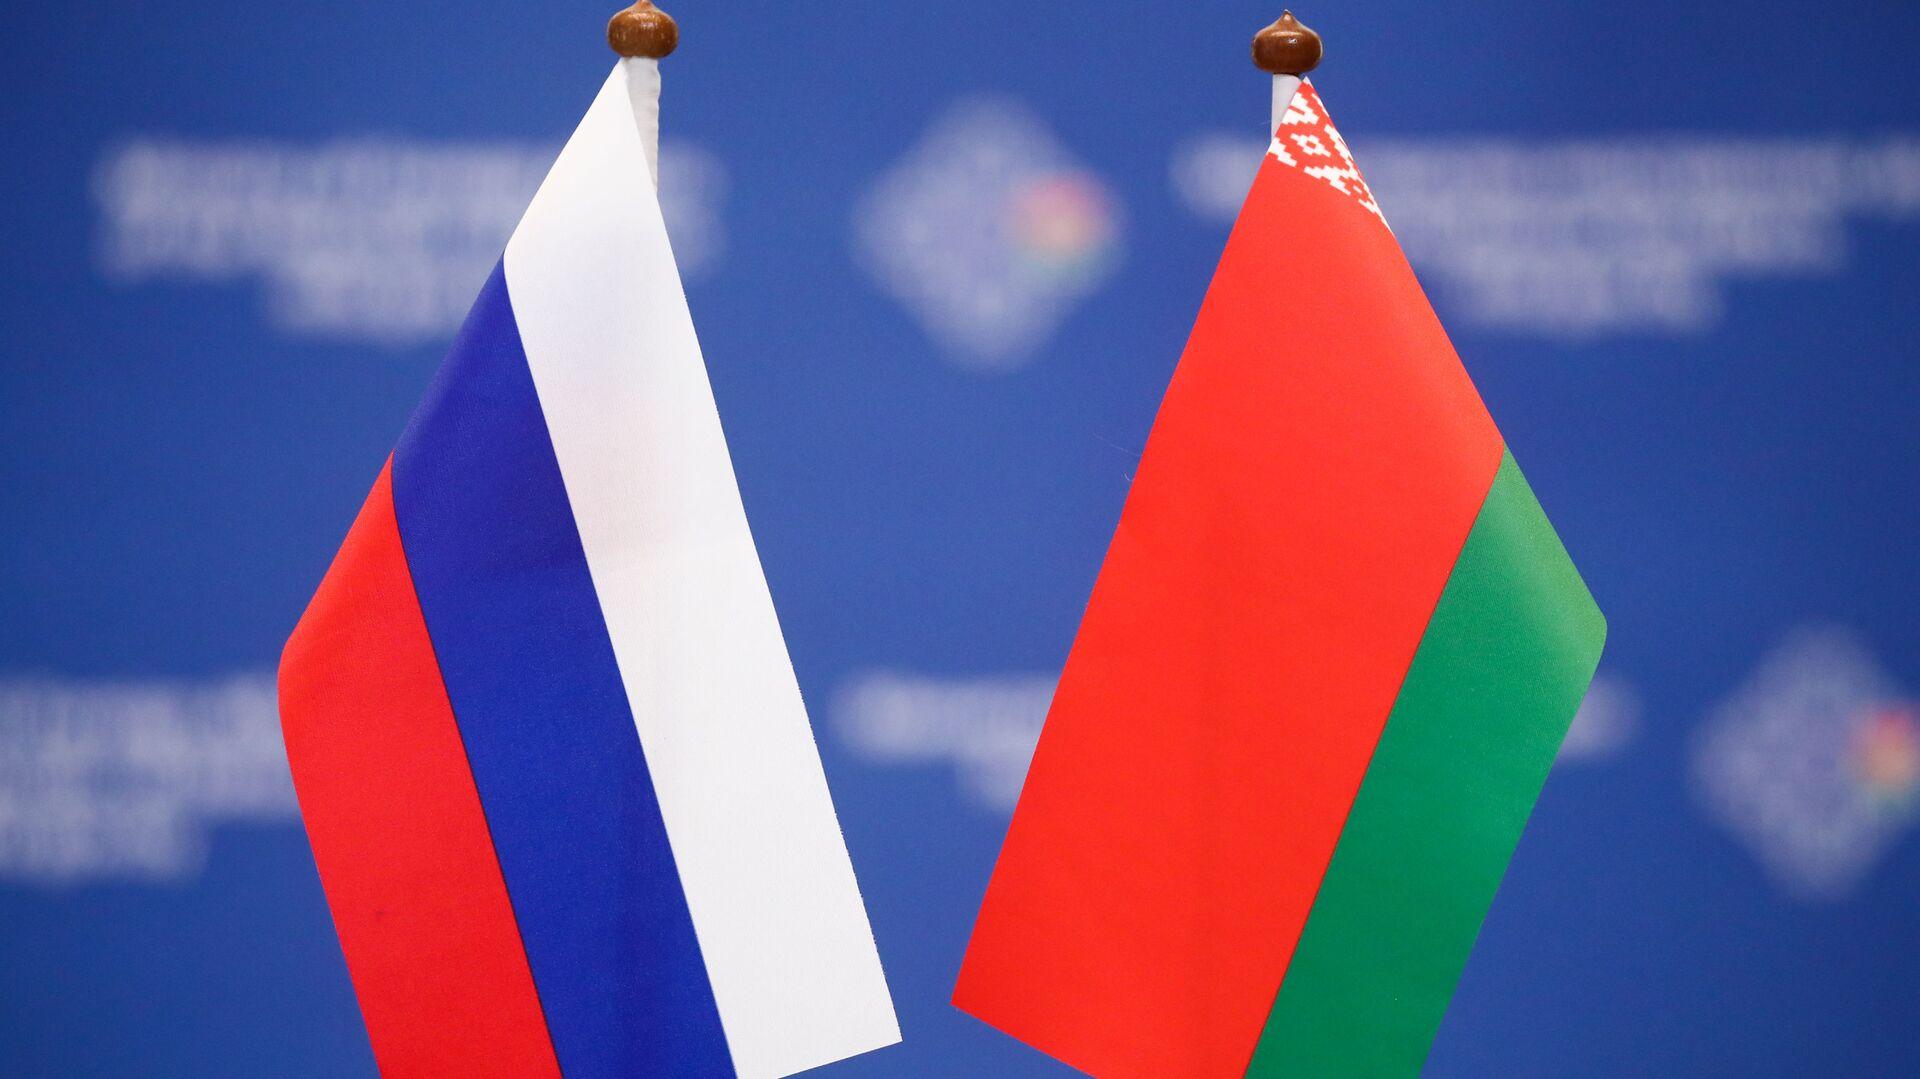 Флаги России и Беларуси  - Sputnik Беларусь, 1920, 01.10.2021